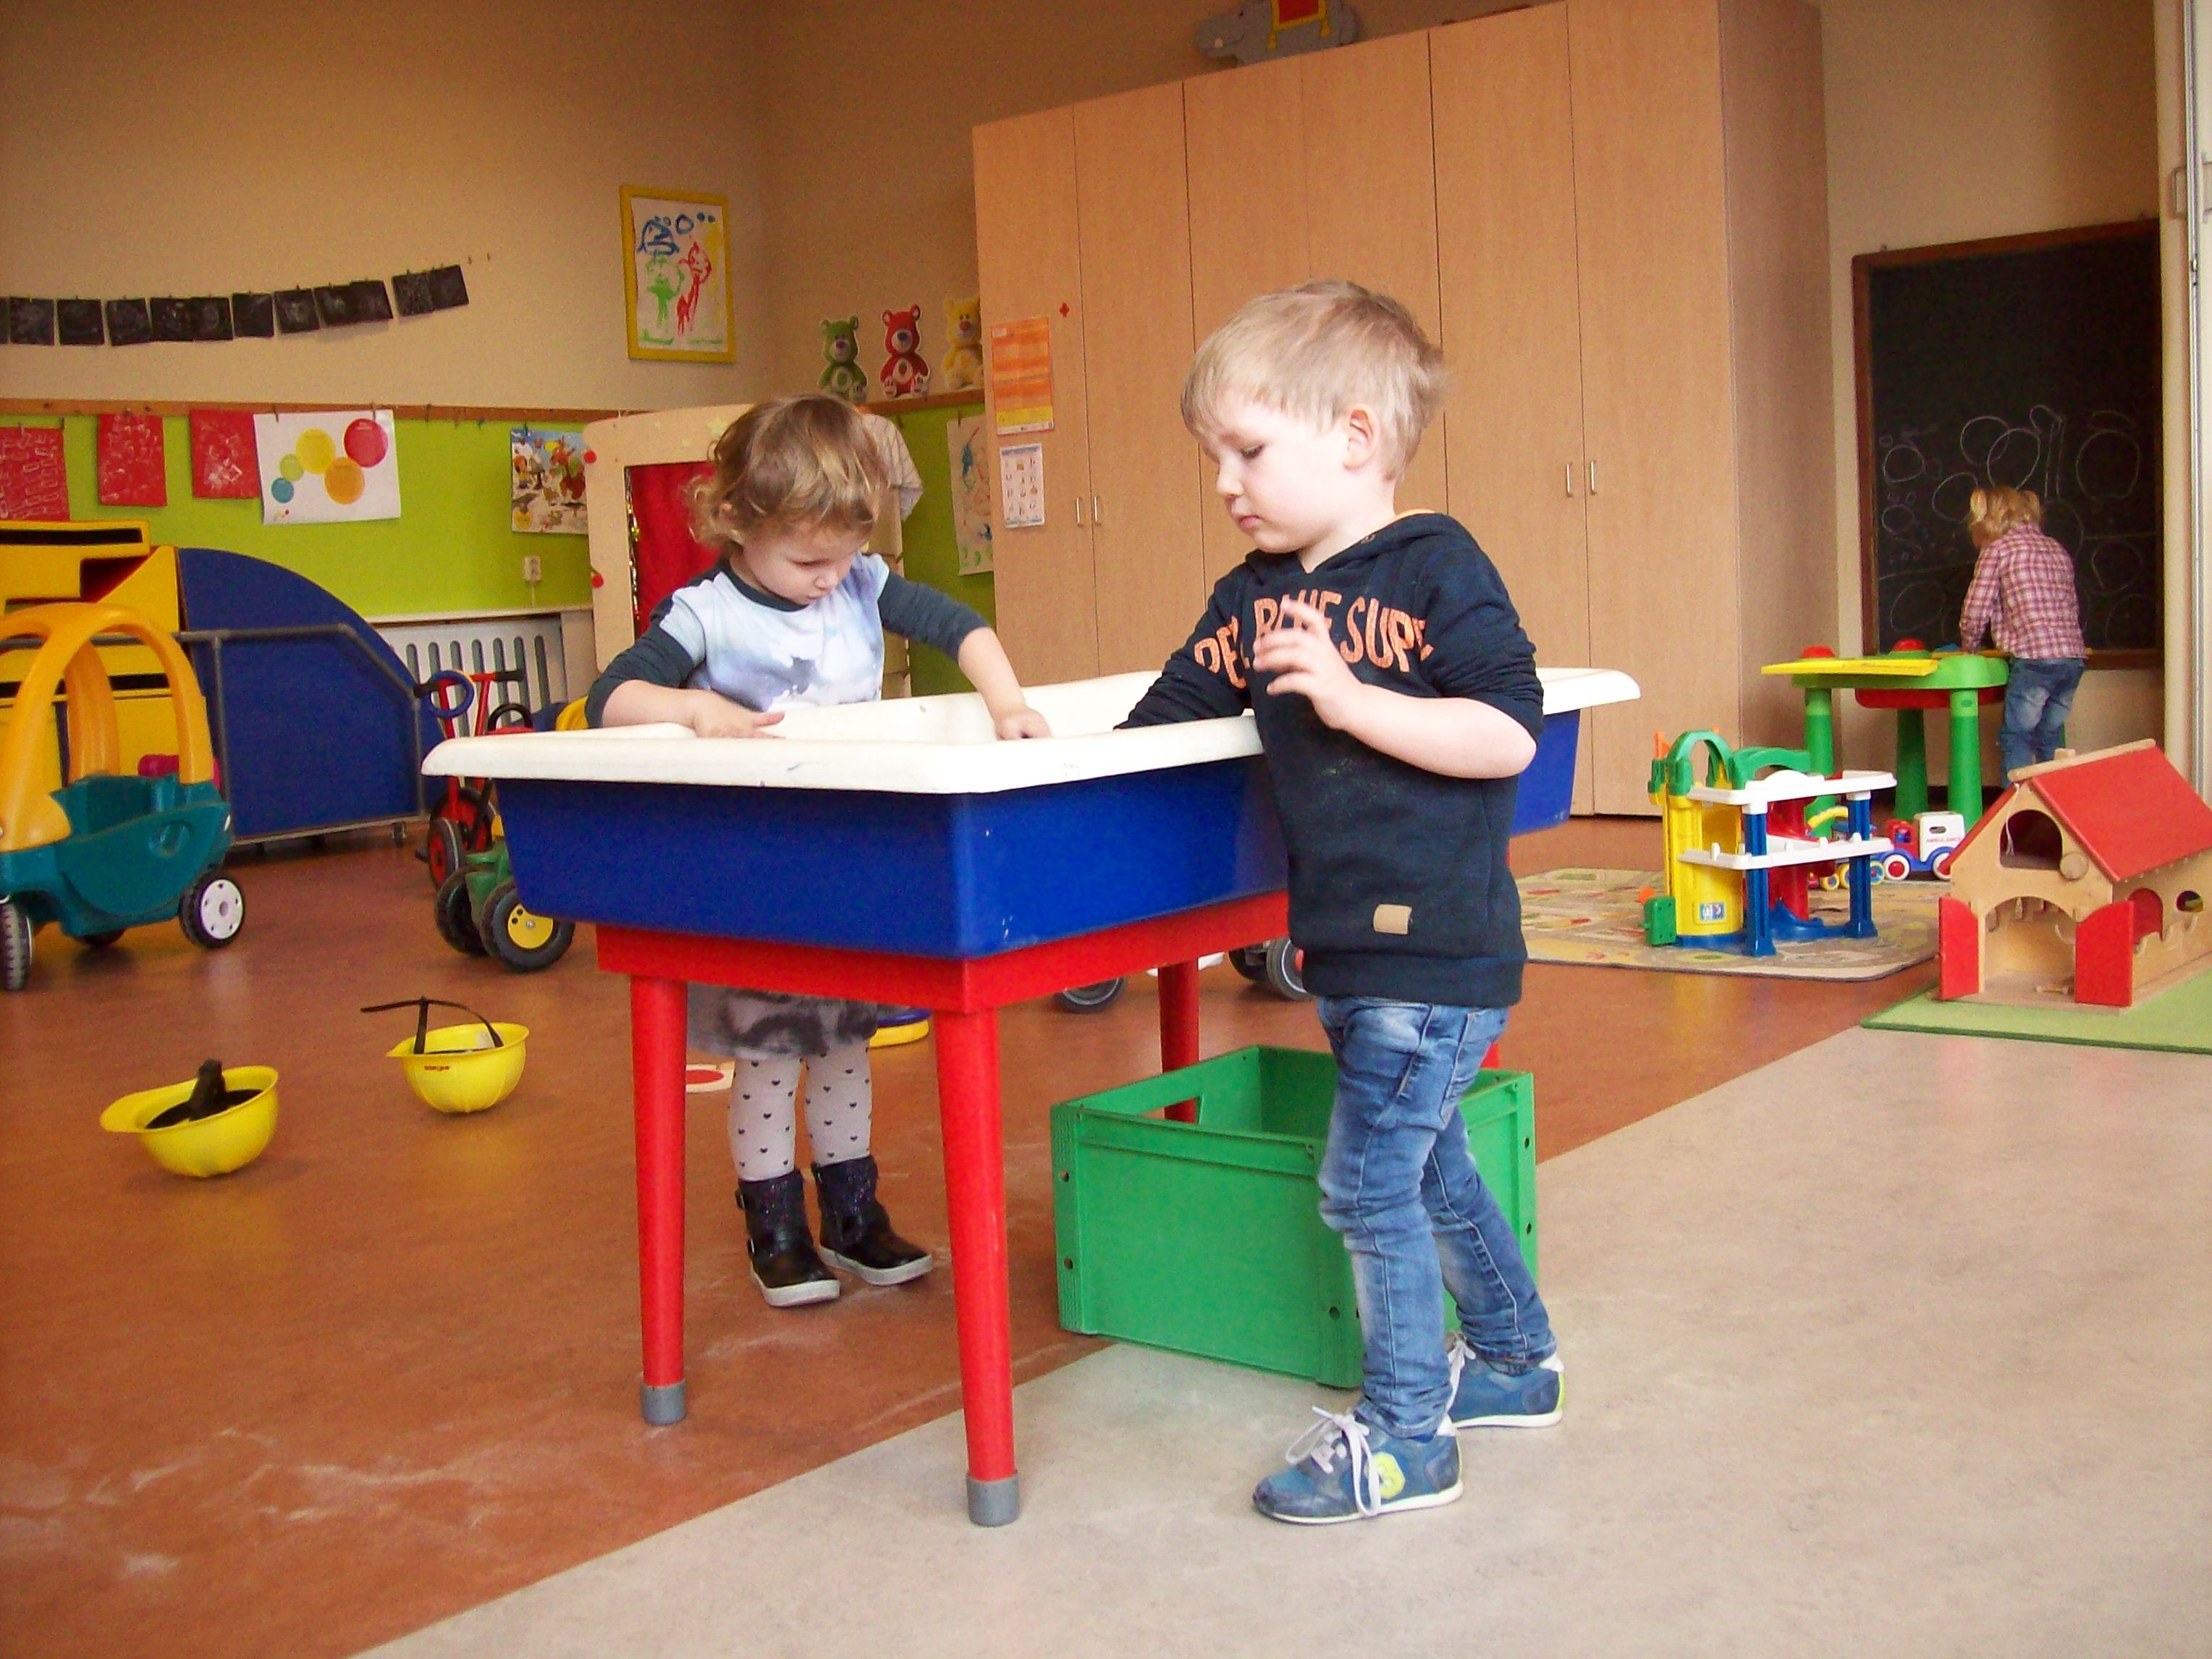 Peuteropvang 't Kattekuorke Jirnsum - Kids First COP groep